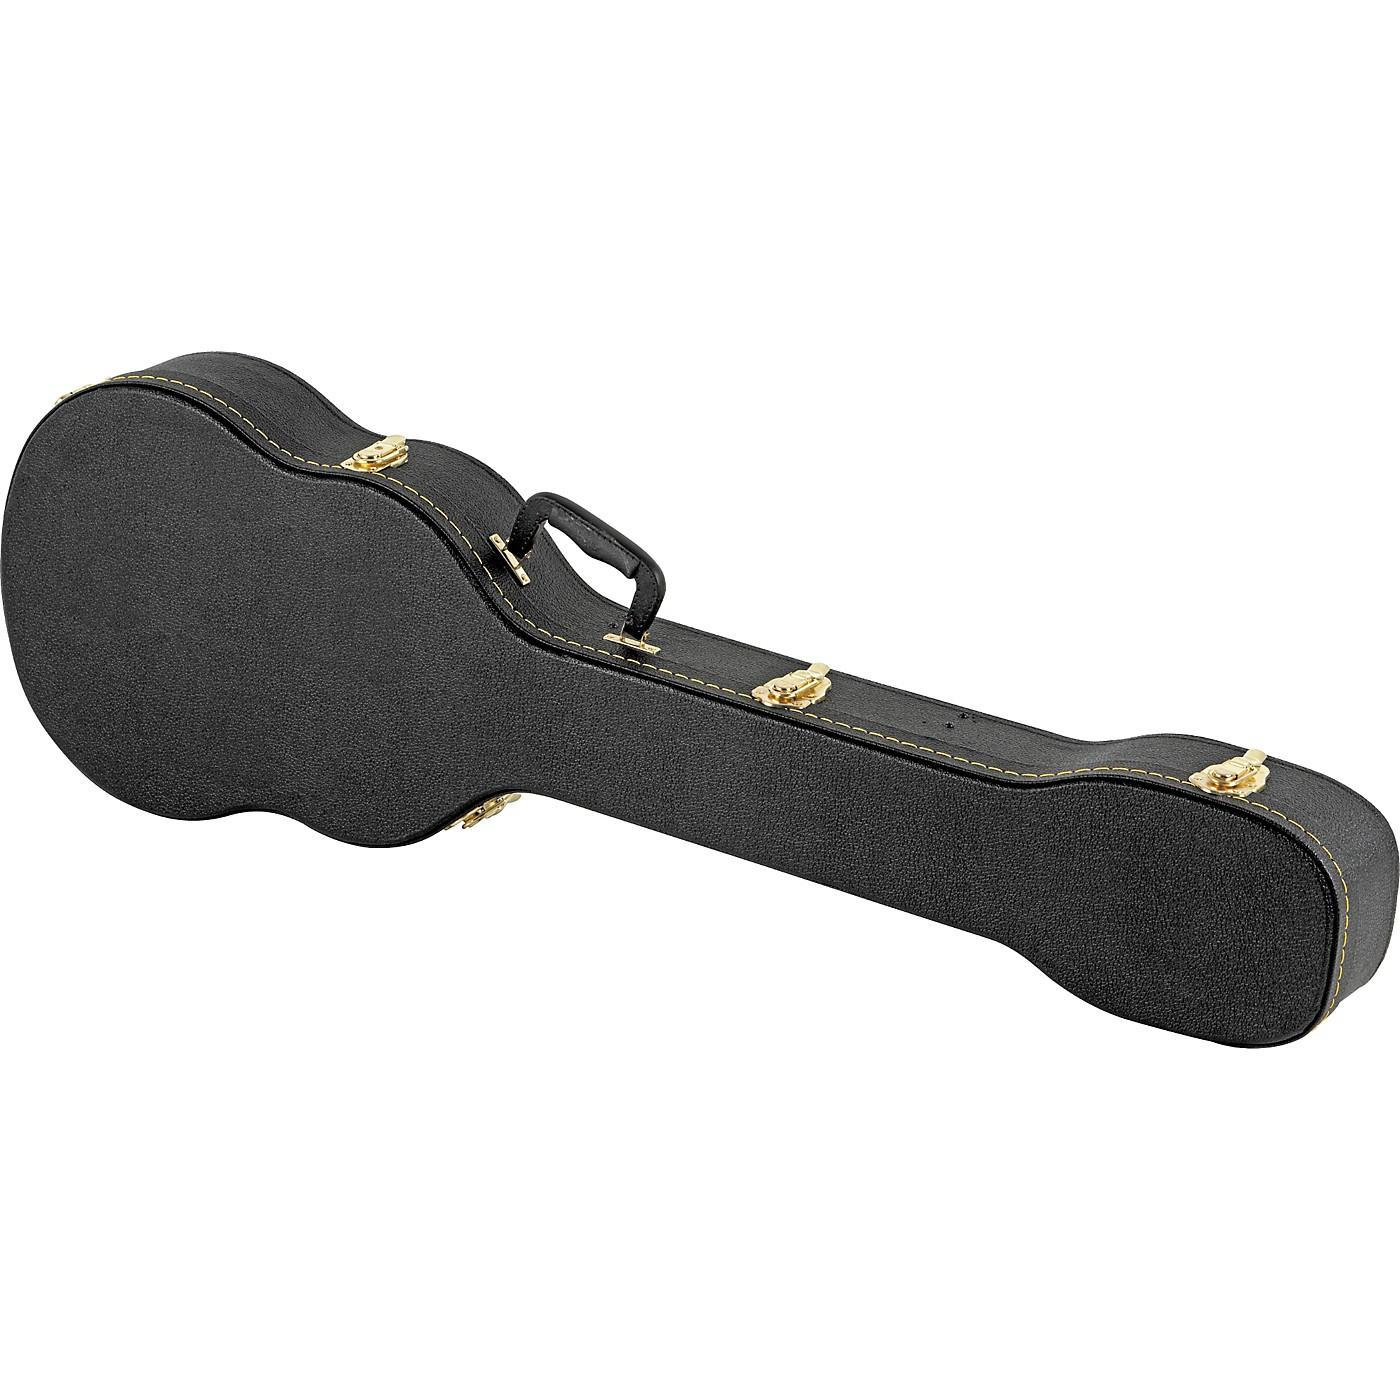 Musician's Gear Electric Bass Case Violin Shaped thumbnail